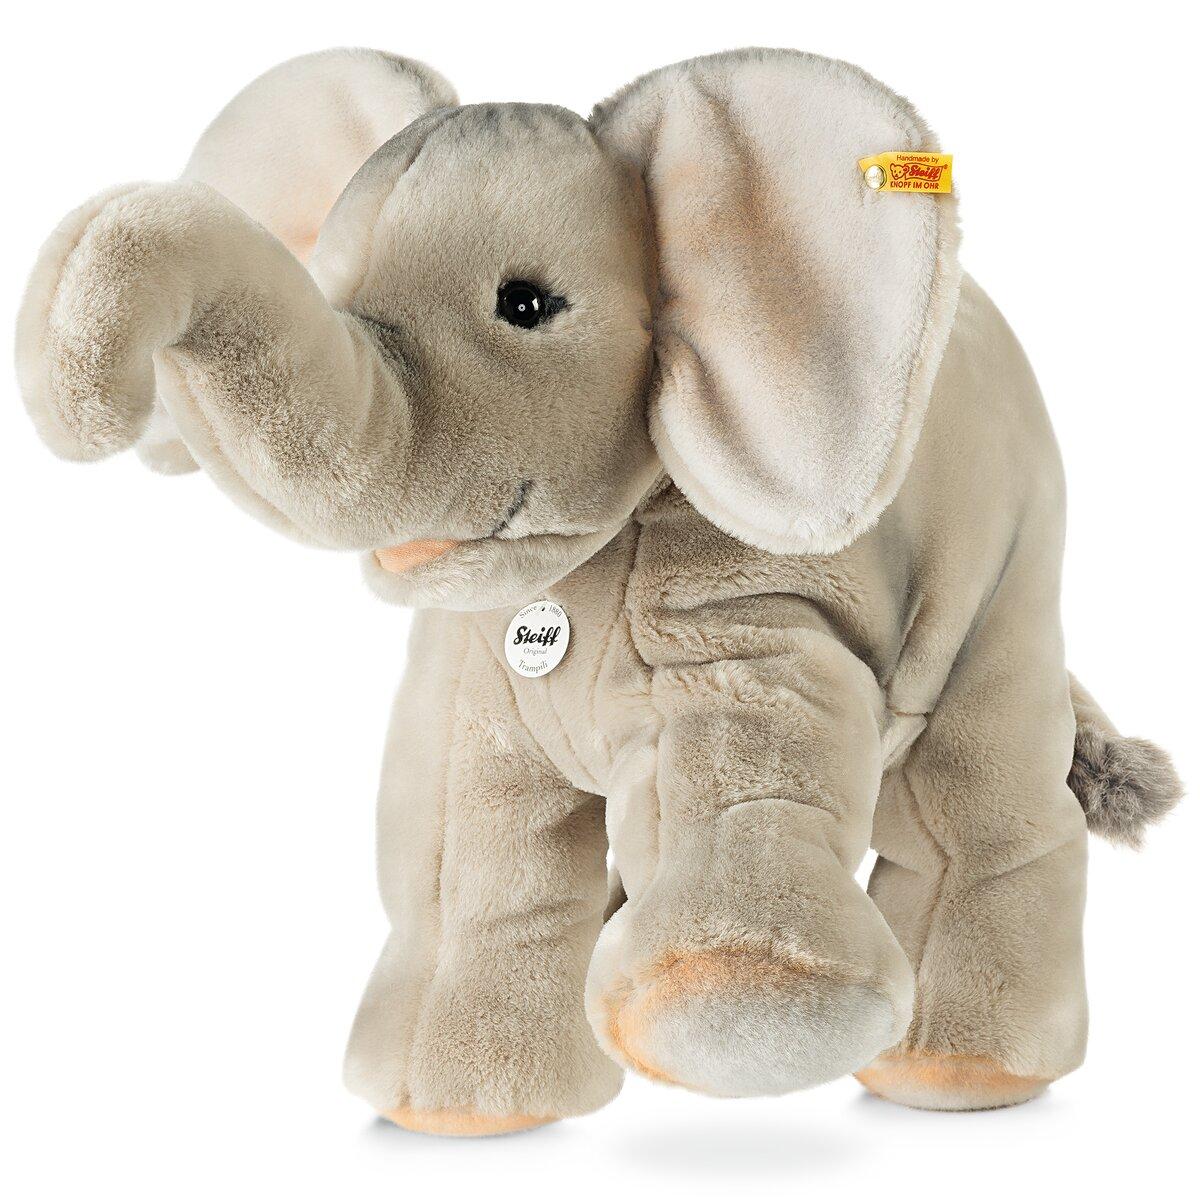 картинки игрушек слоненок успеха самому